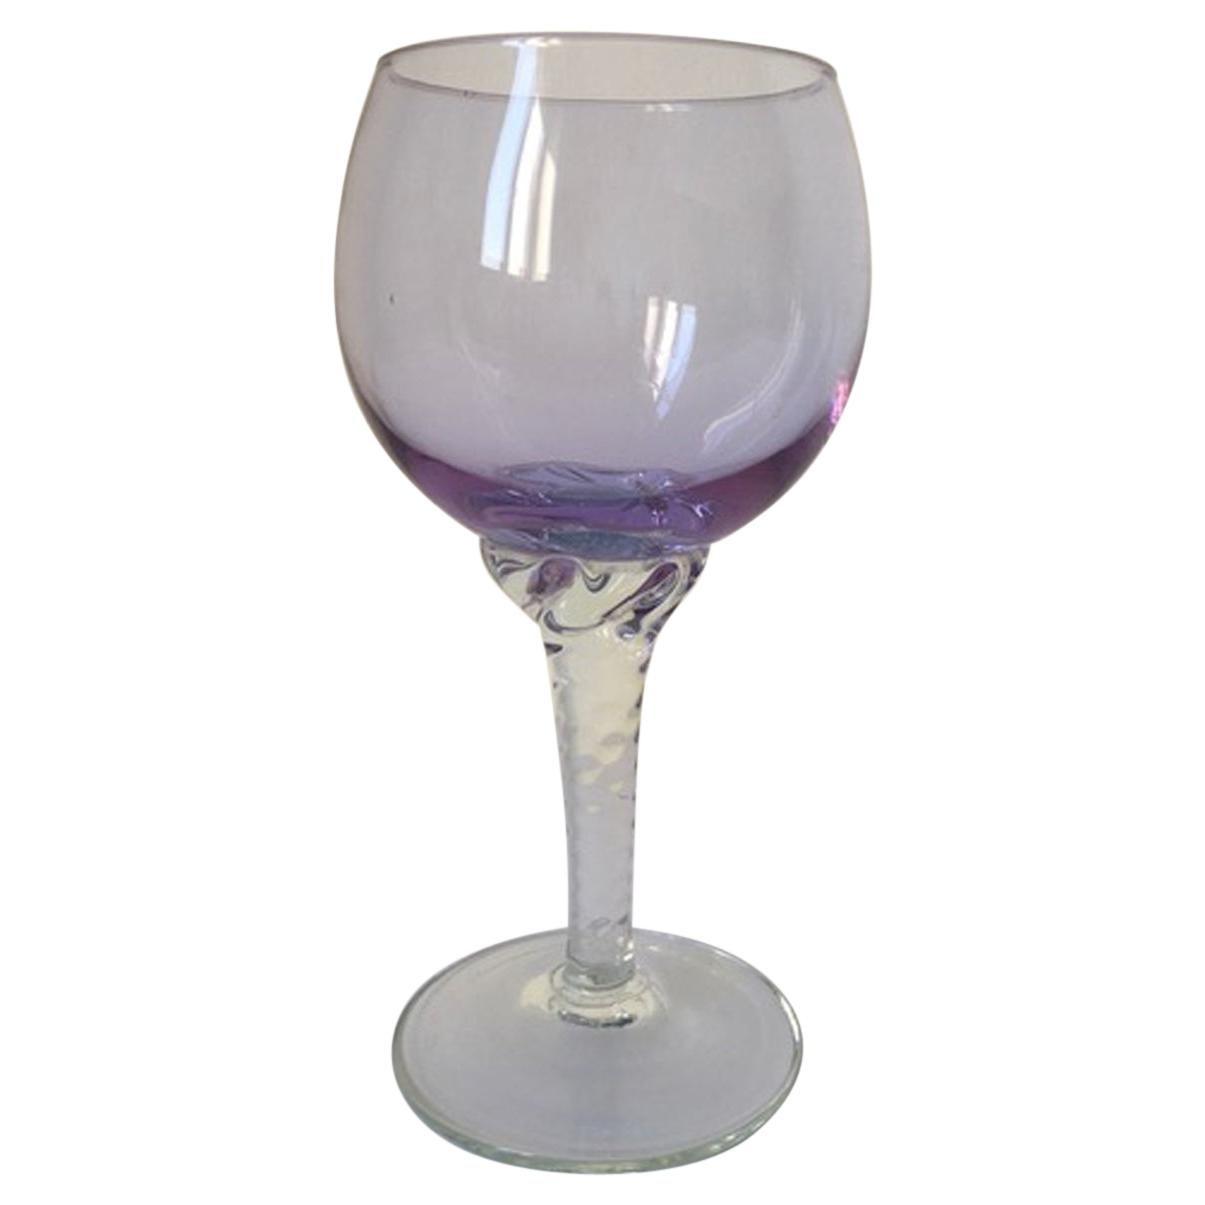 1960, Post-Modern Murano Blown Glass Goblet